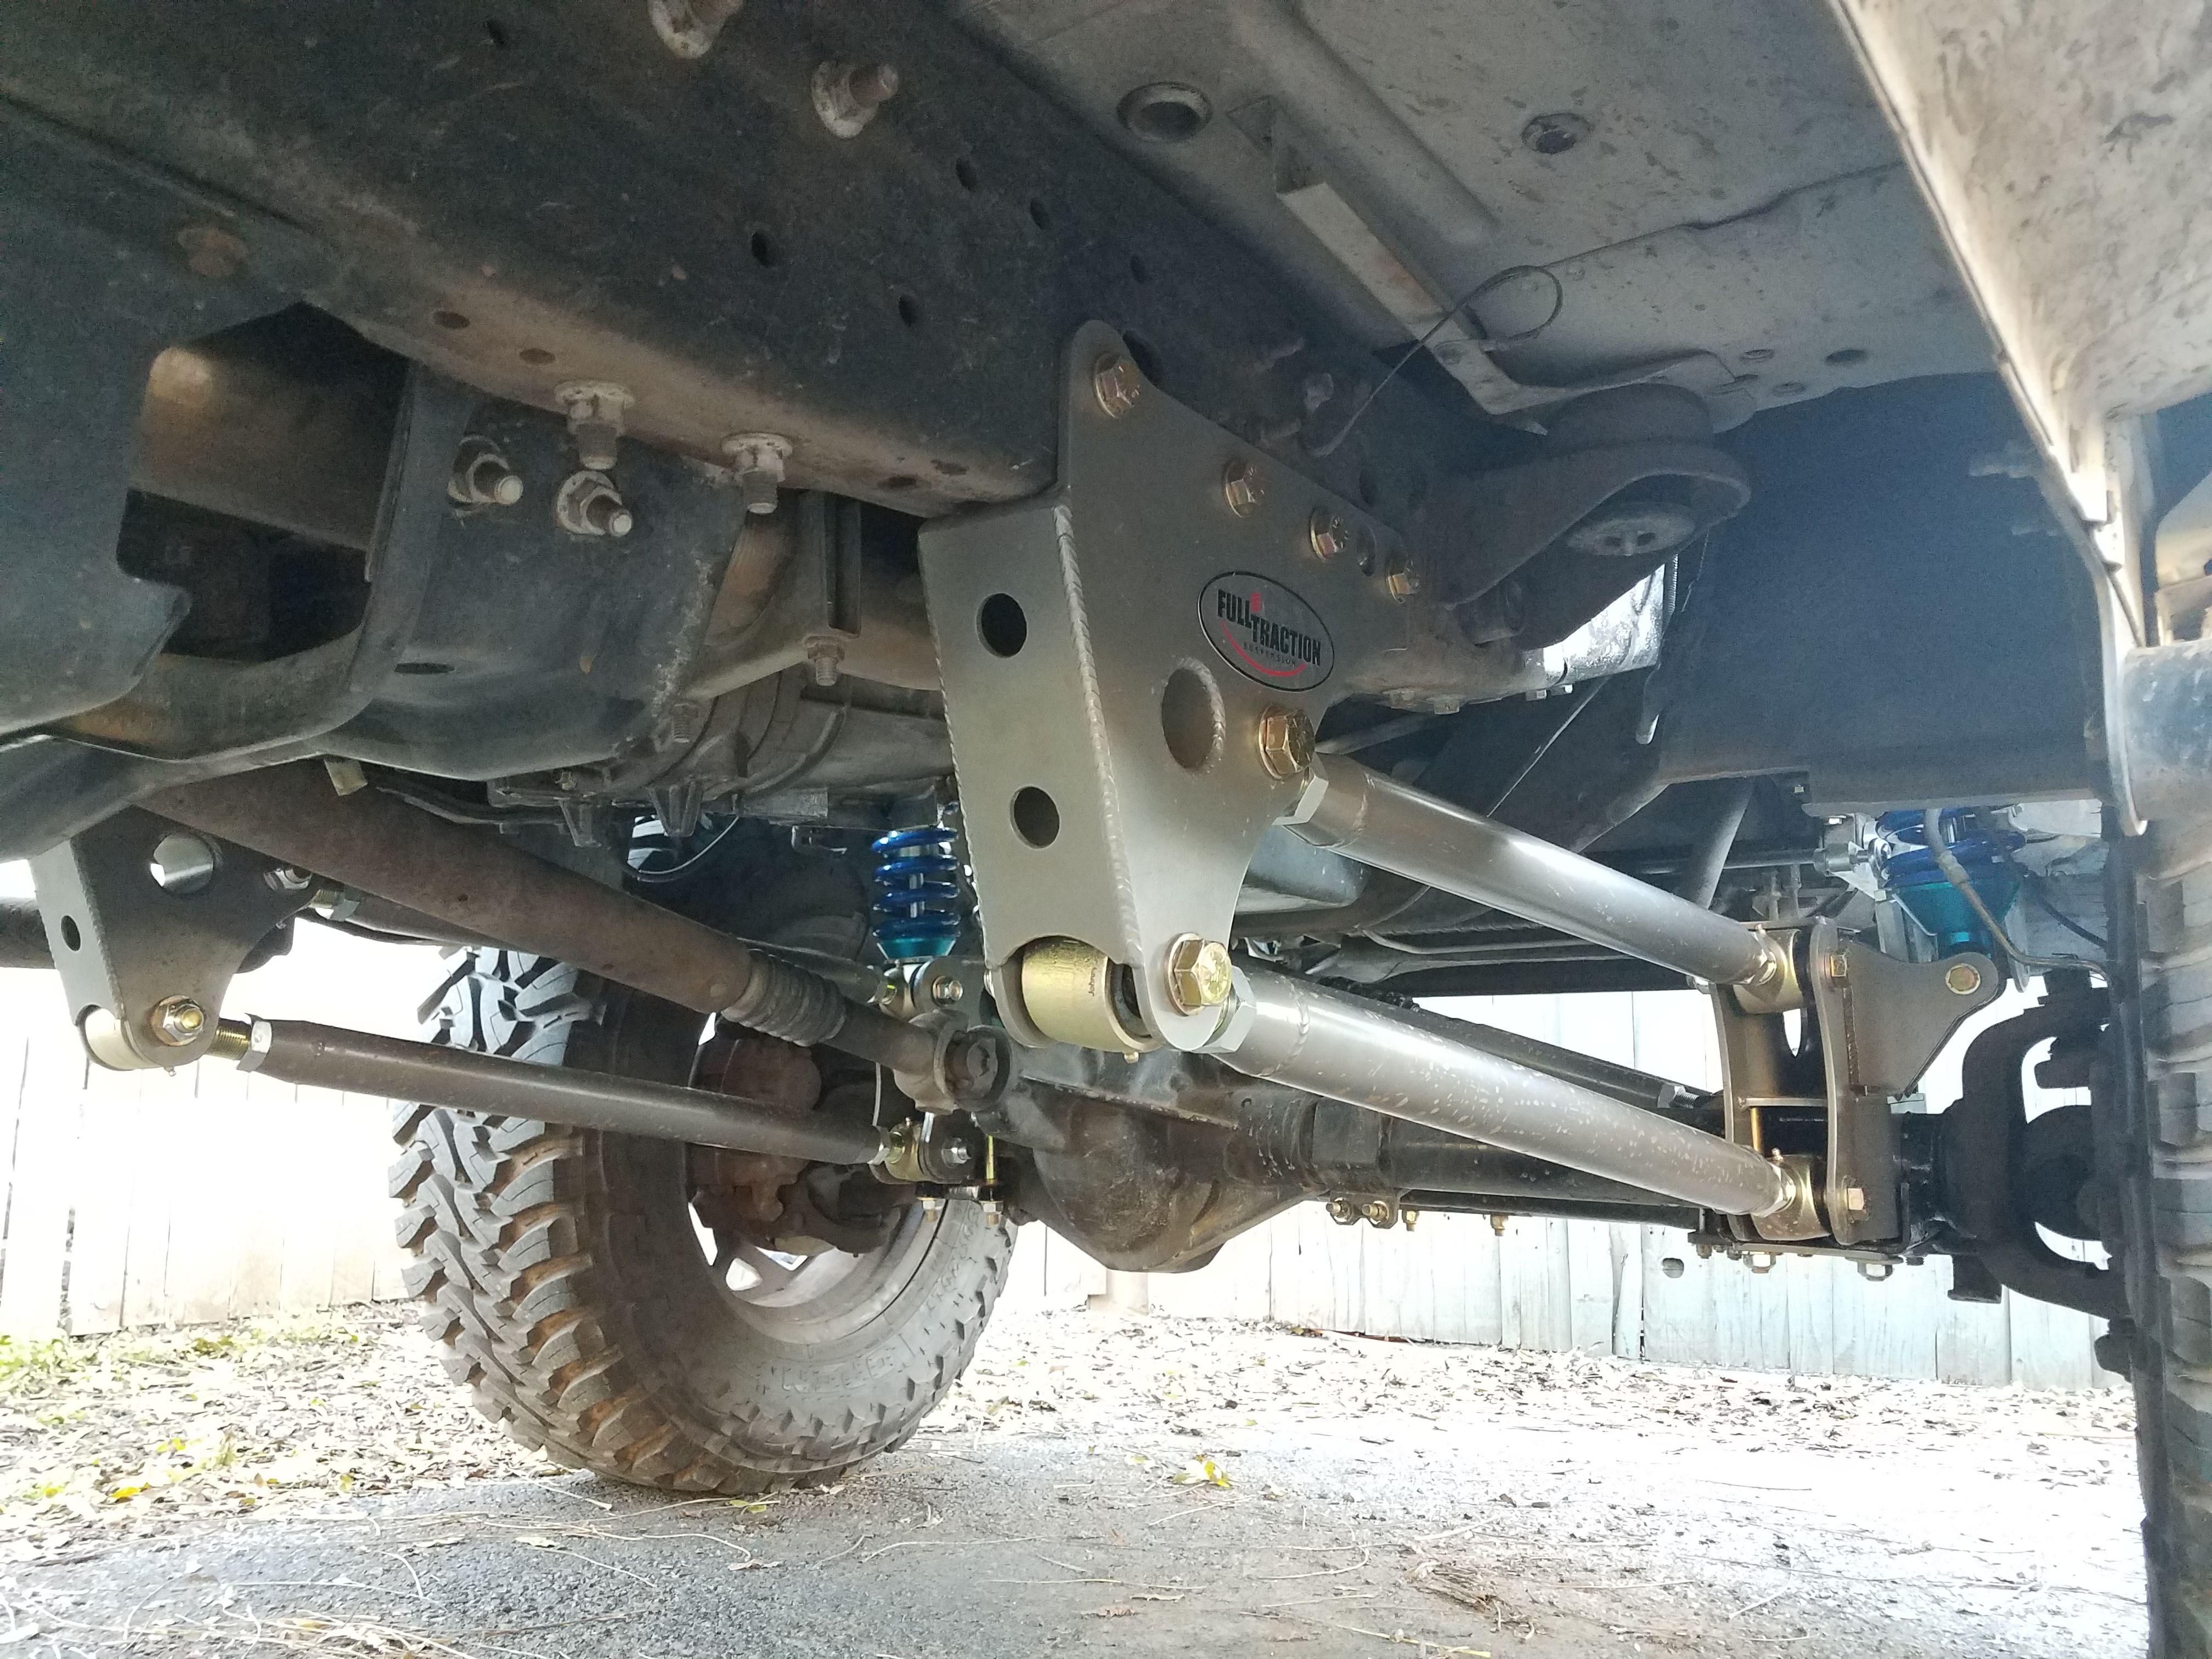 1999 2000 2001 2002 2003 F250 F350 7 3l 6 0 Diesel Excursion Super Duty Leaf Spring Delete 4 Link King Coil Over C Ford Excursion Ford F250 Super Duty 4x4 F250